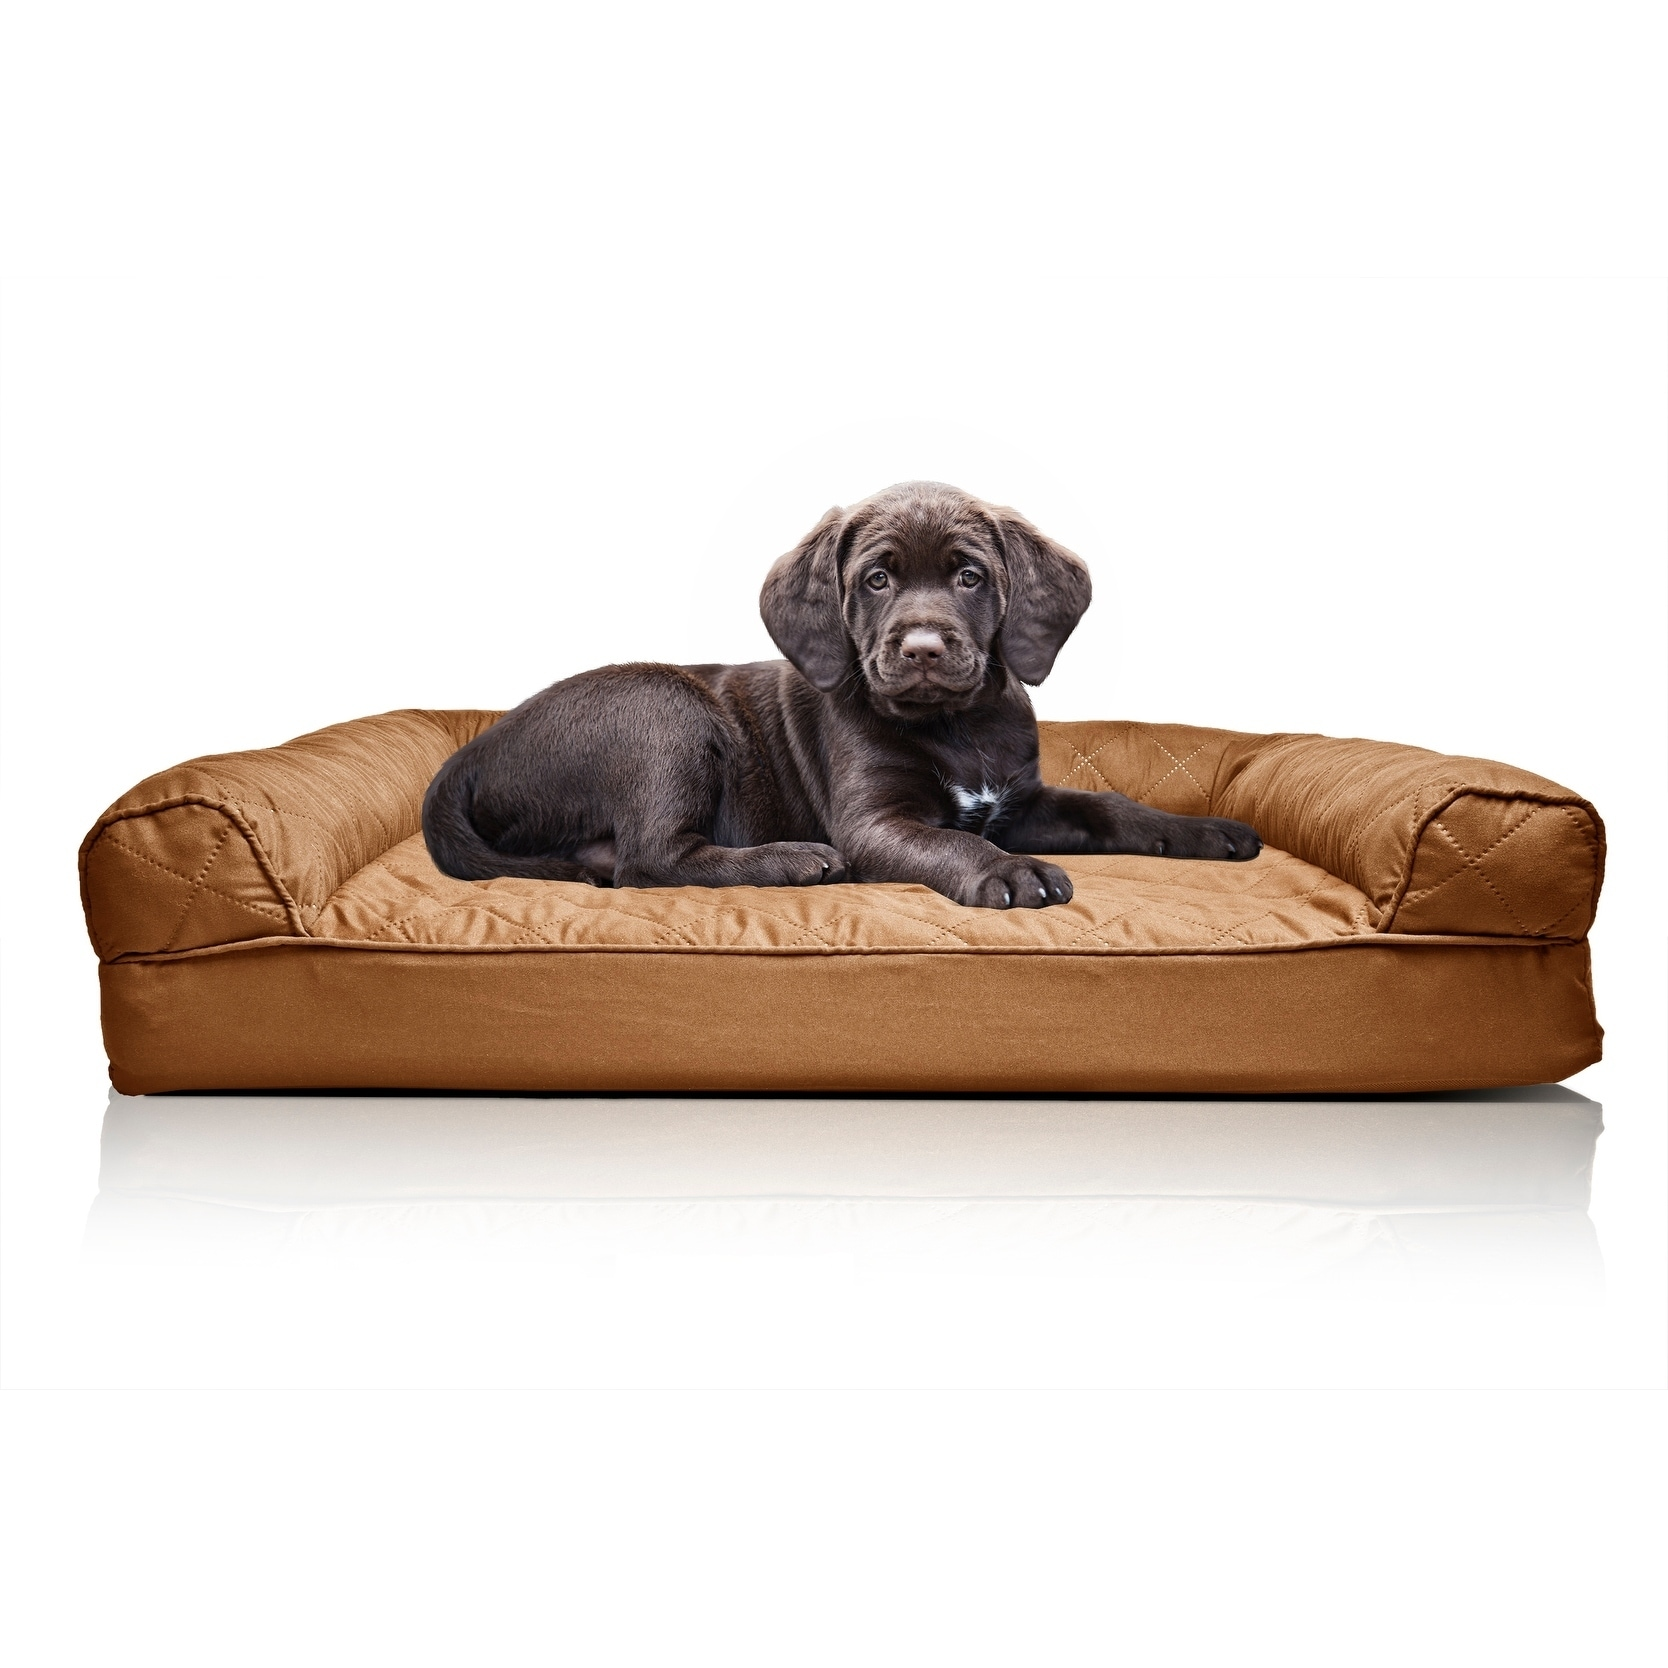 Furhaven Pet Bed Quilted Orthopedic Sofa Dog Bed Dog Pet Beds